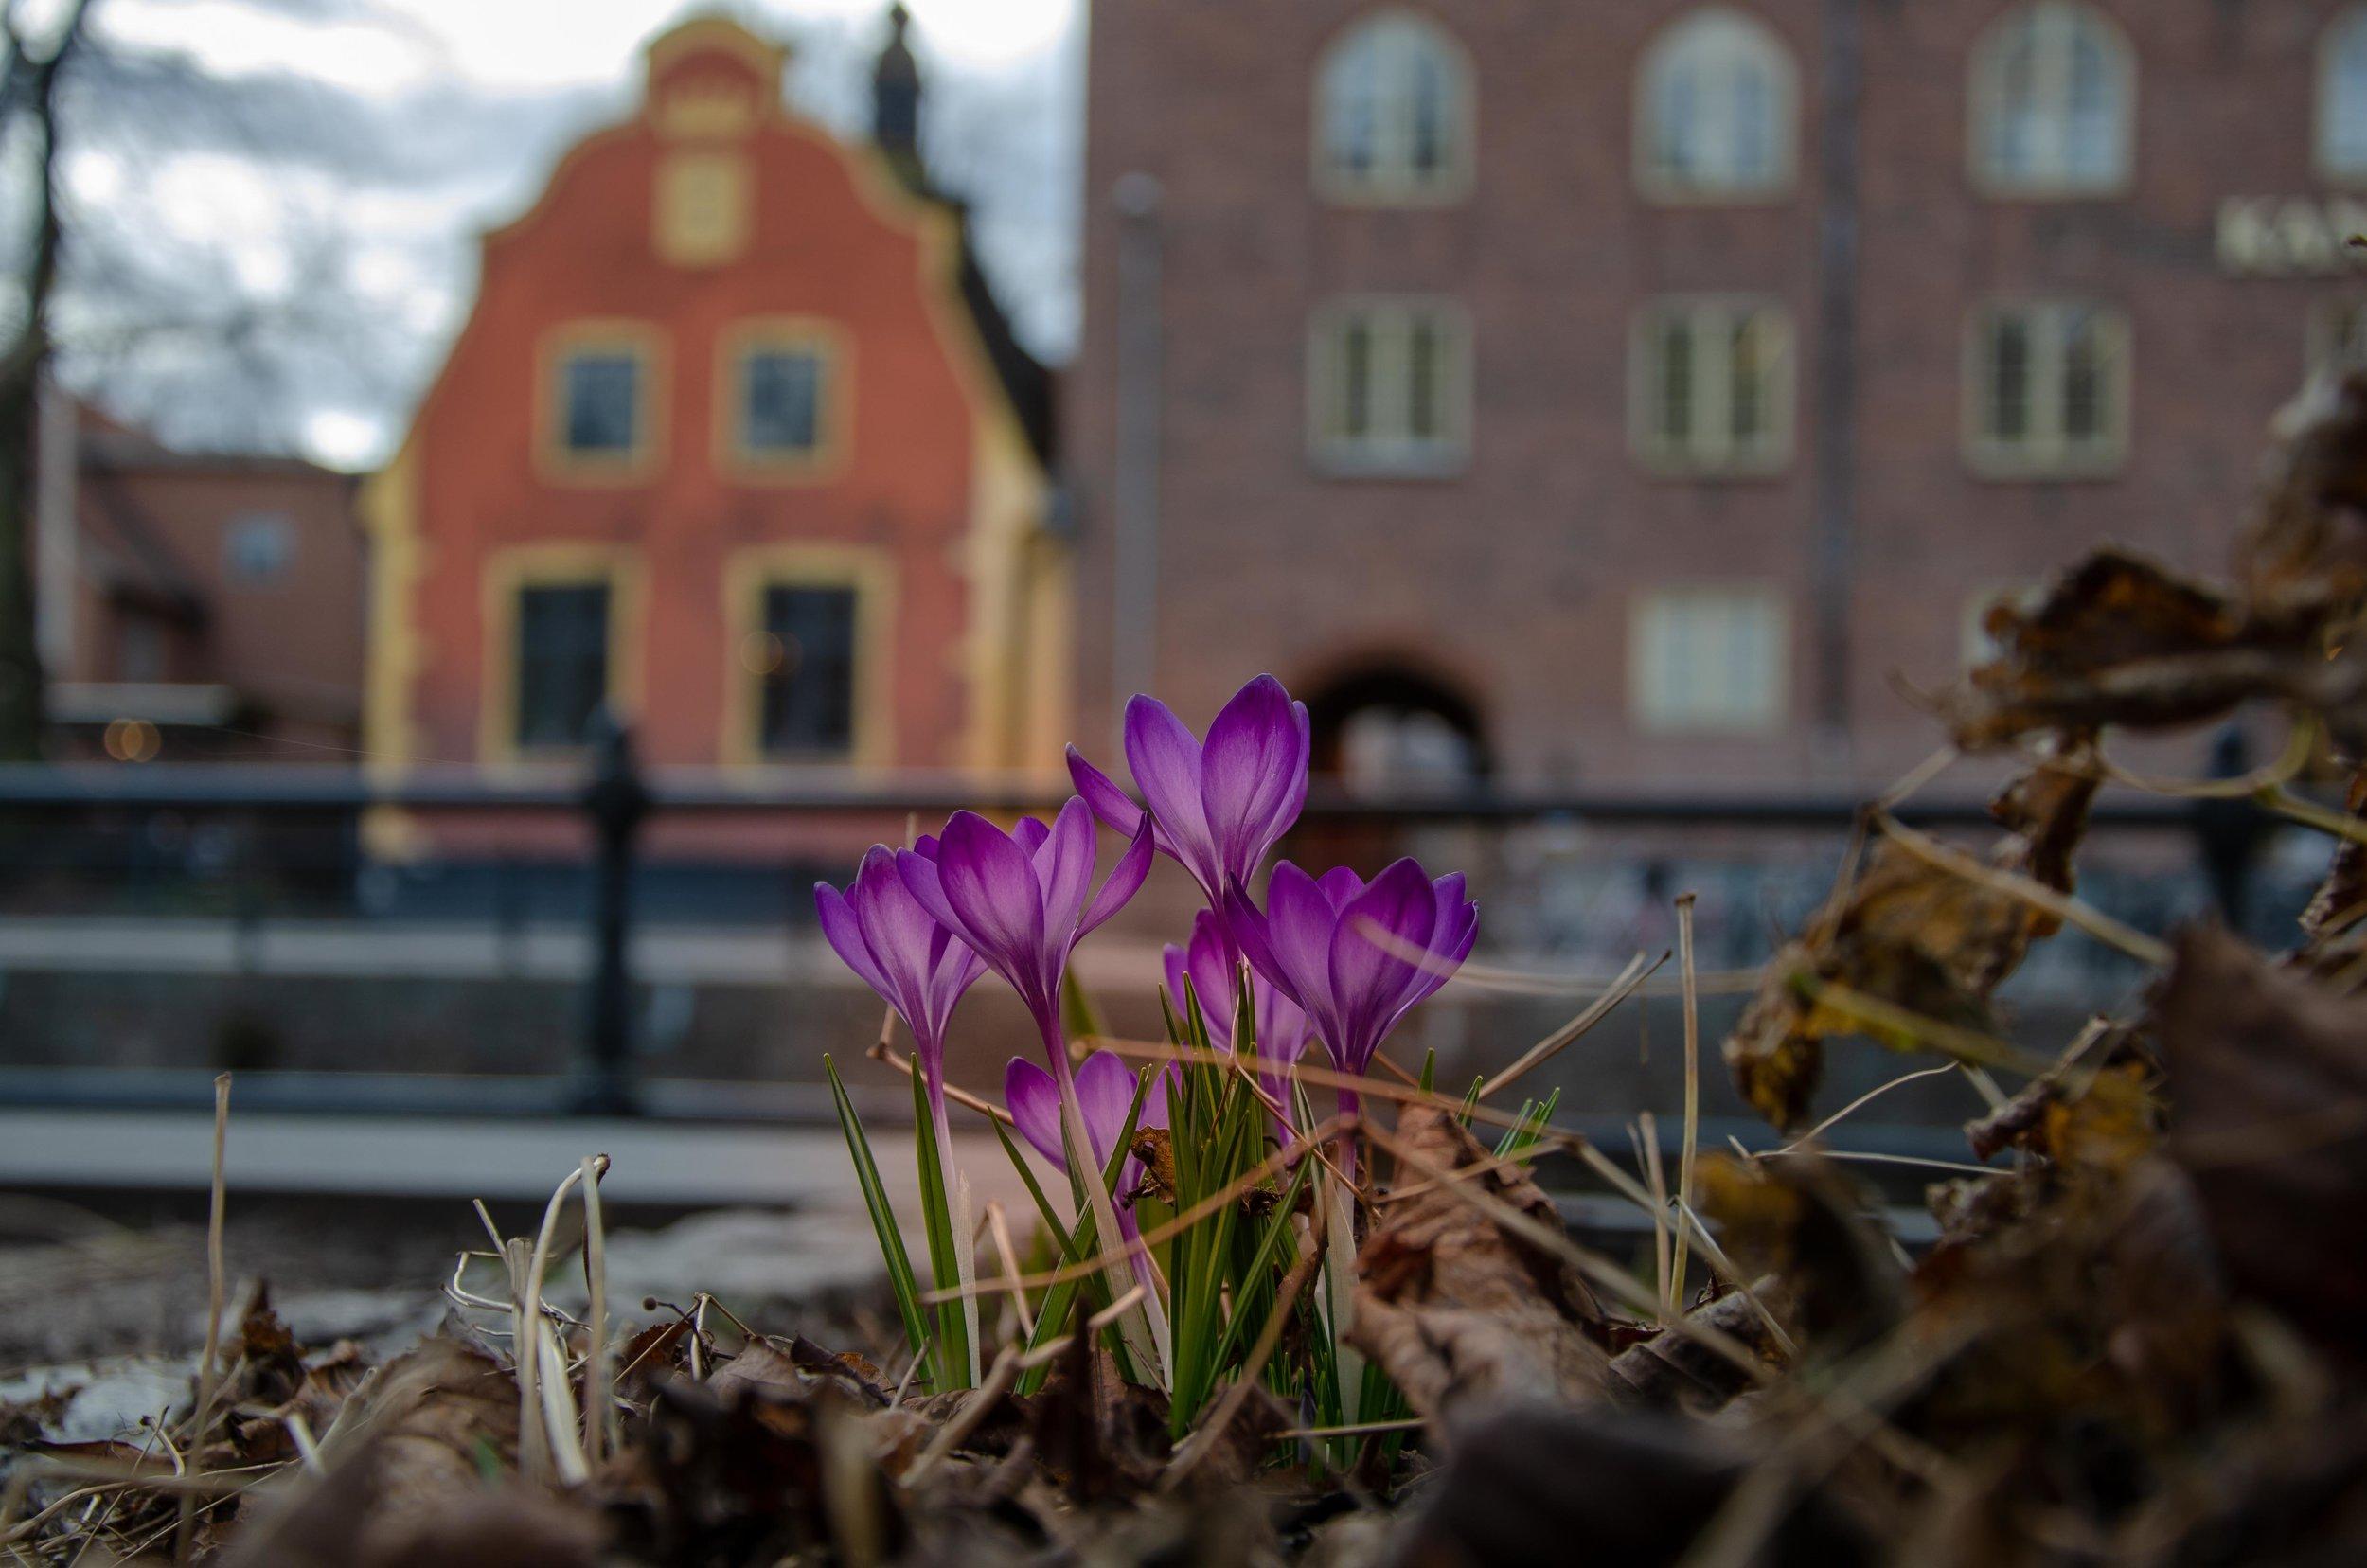 Photo by  Johannes Plenio  on  Unsplash